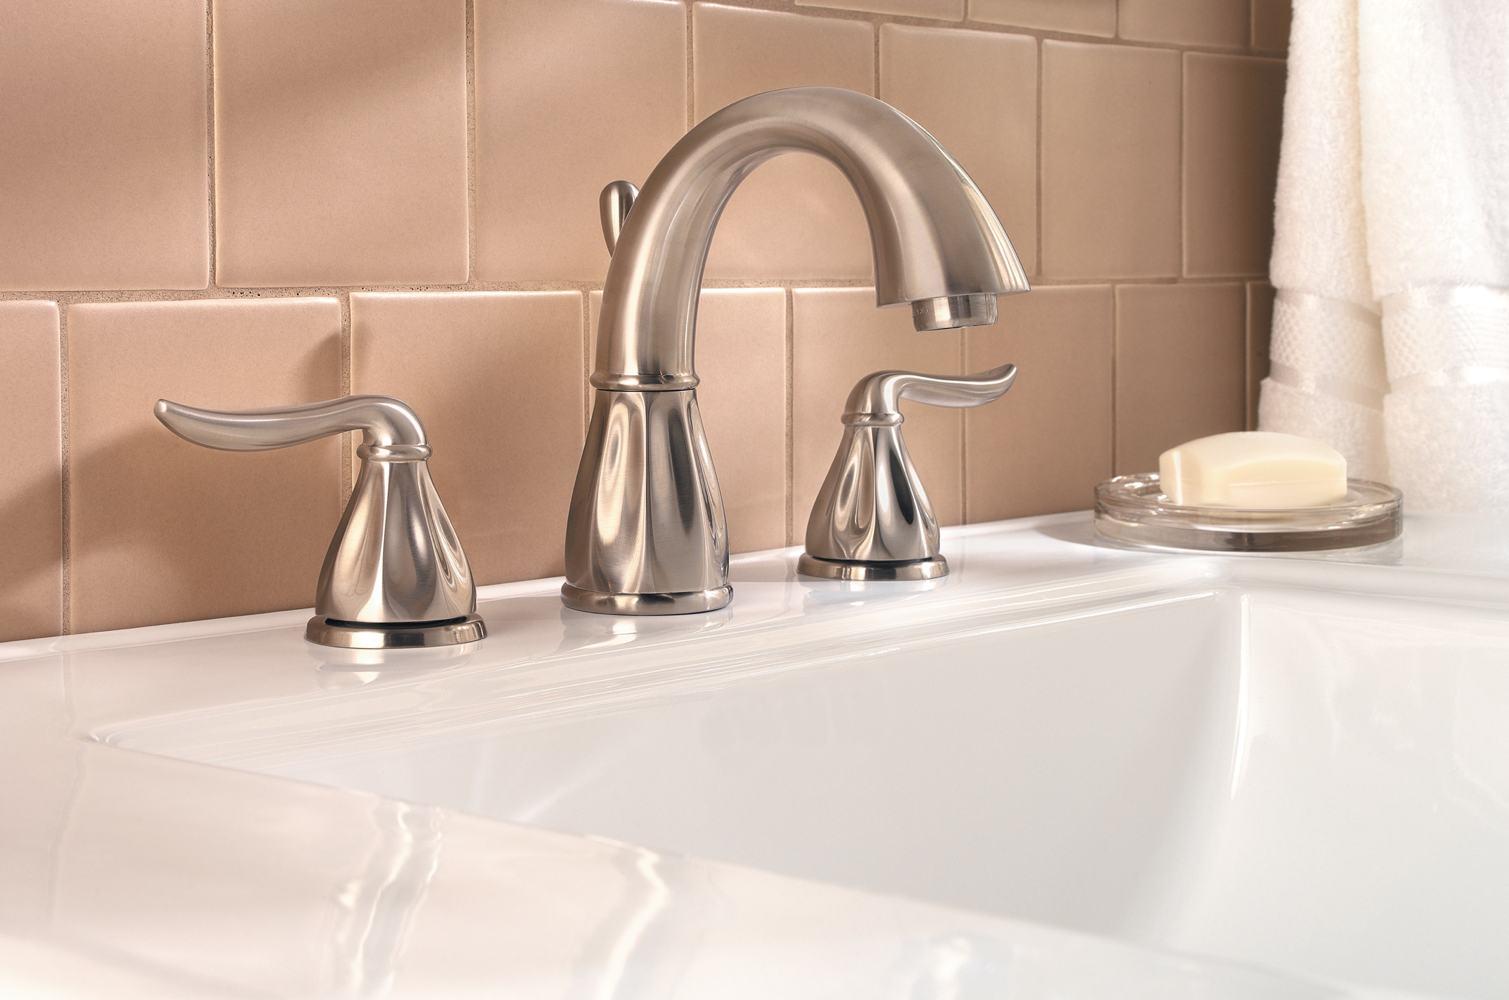 Pfister Sedona 2Handle 8 Widespread Bathroom Faucet in